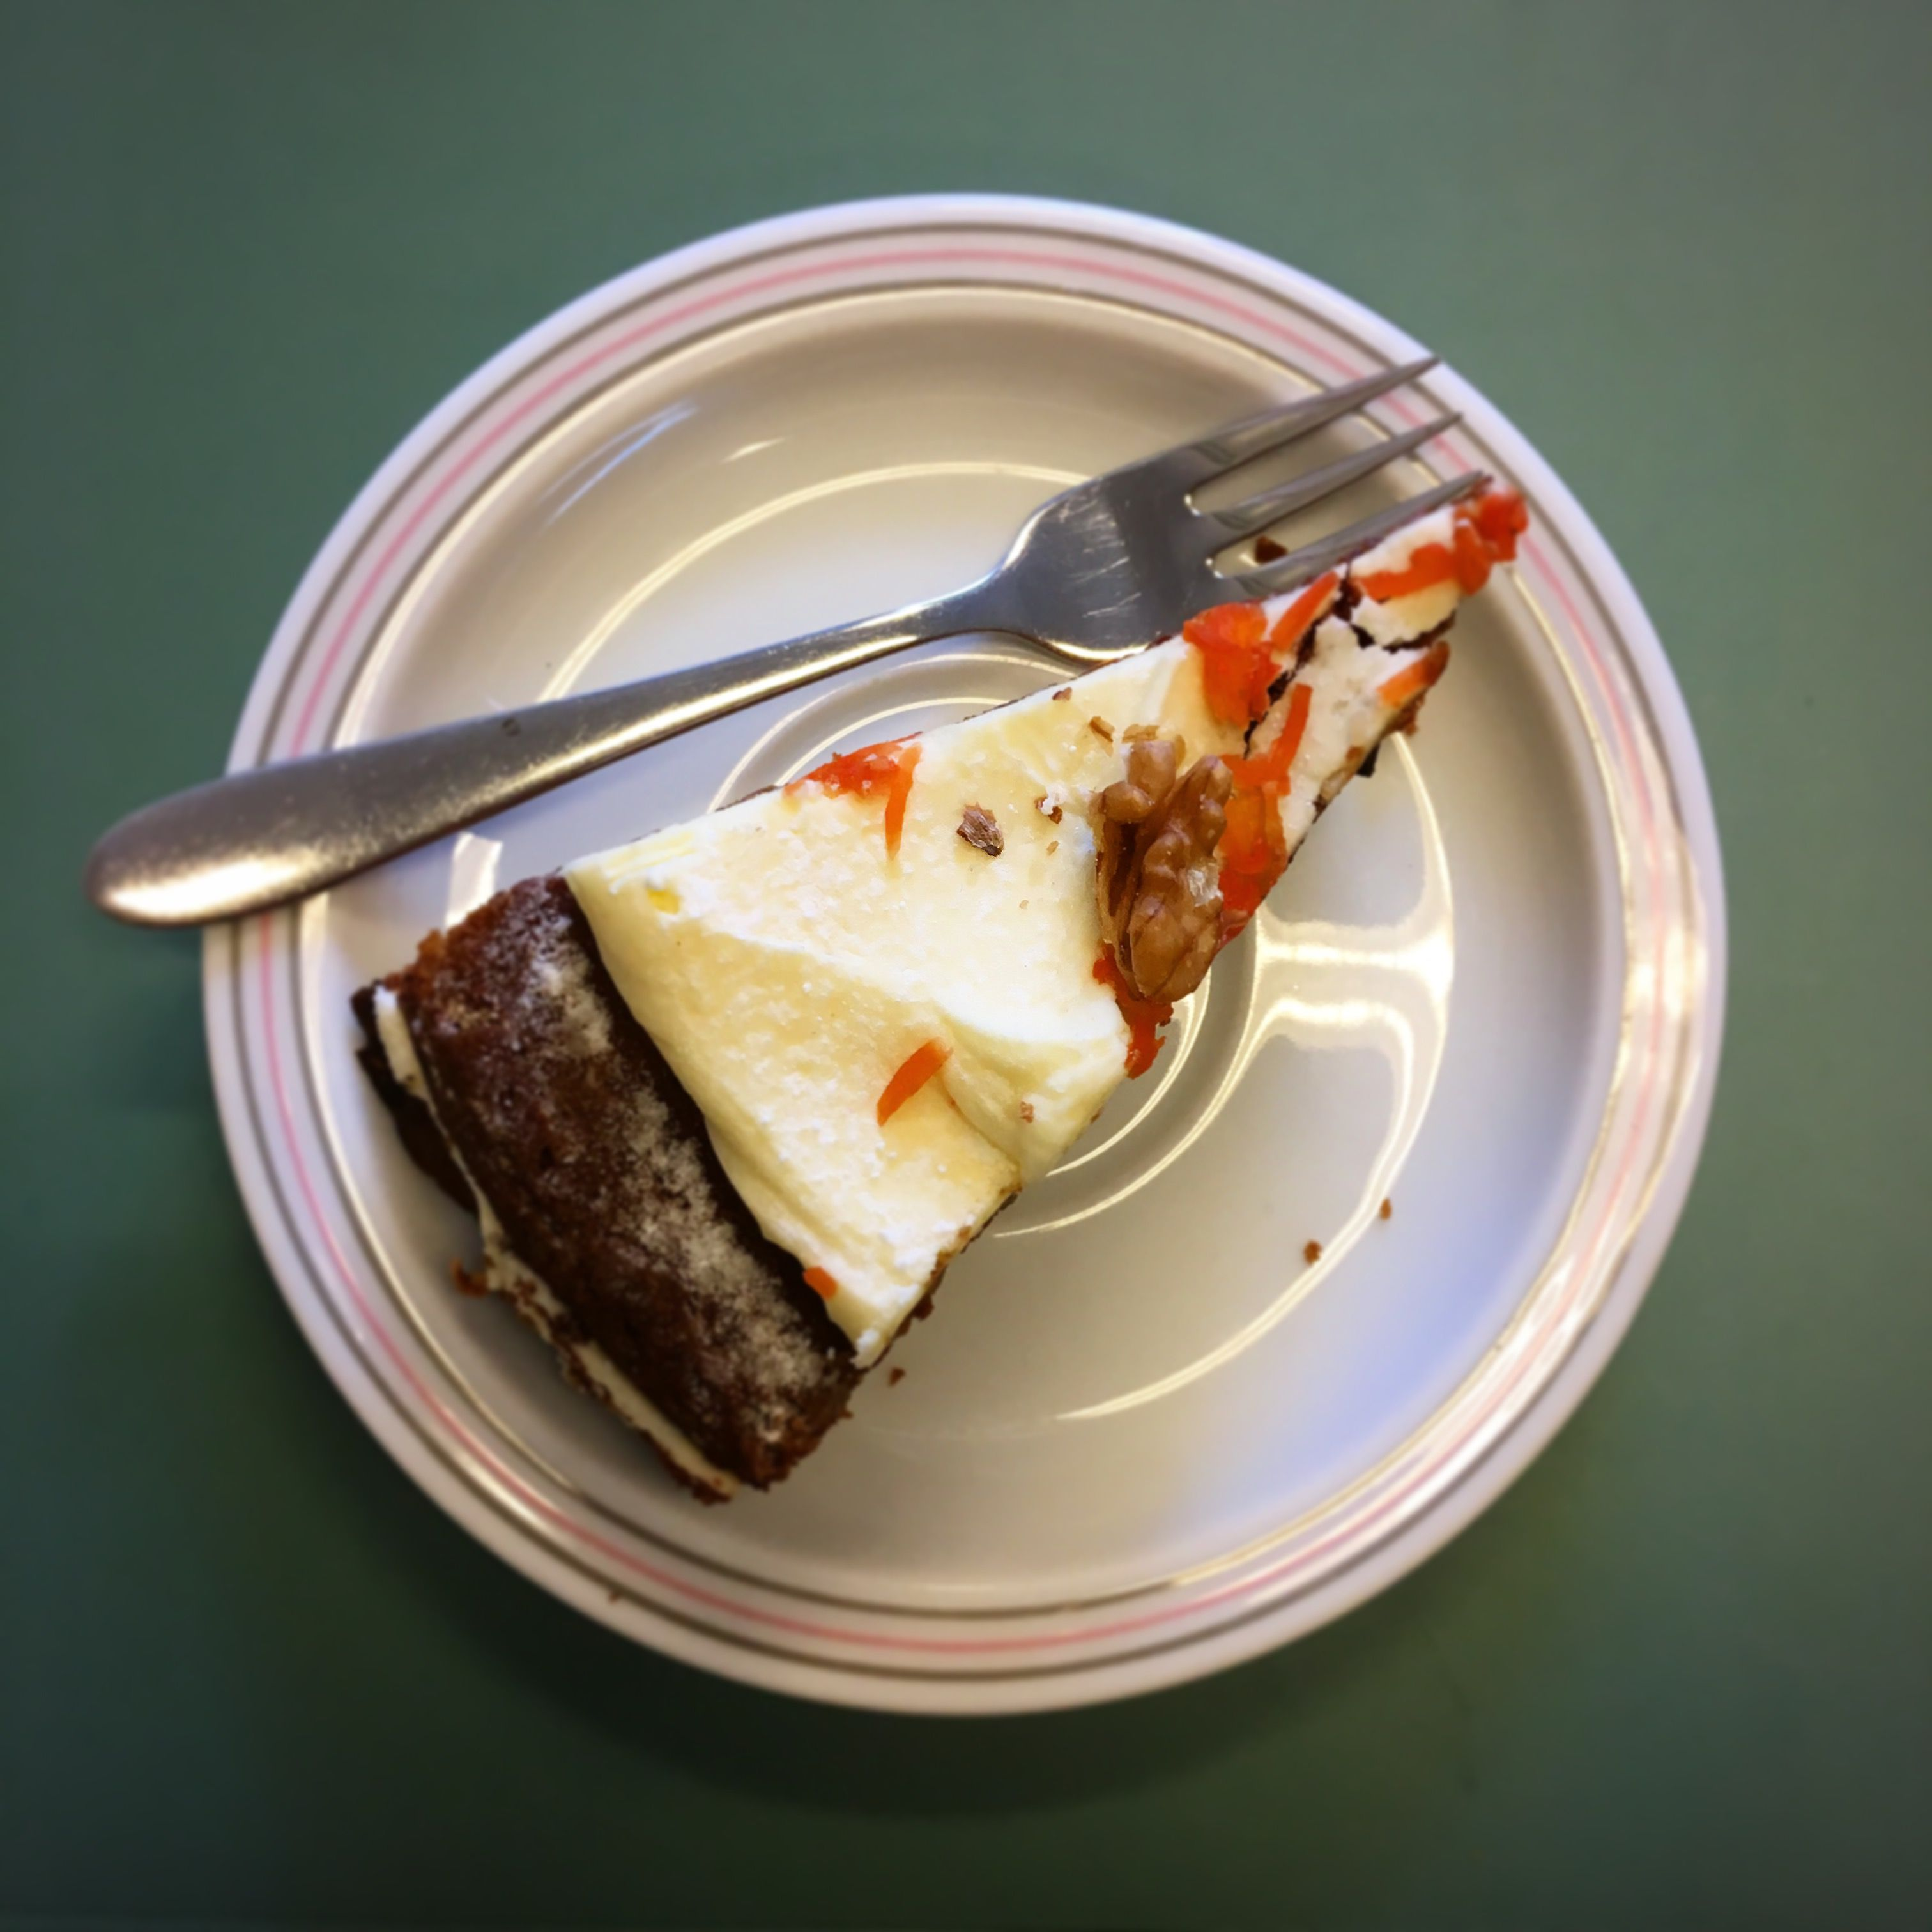 kwekkeboom taart wortel #taart   #patisserie #kwekkeboom   #amsterdam  kwekkeboom taart